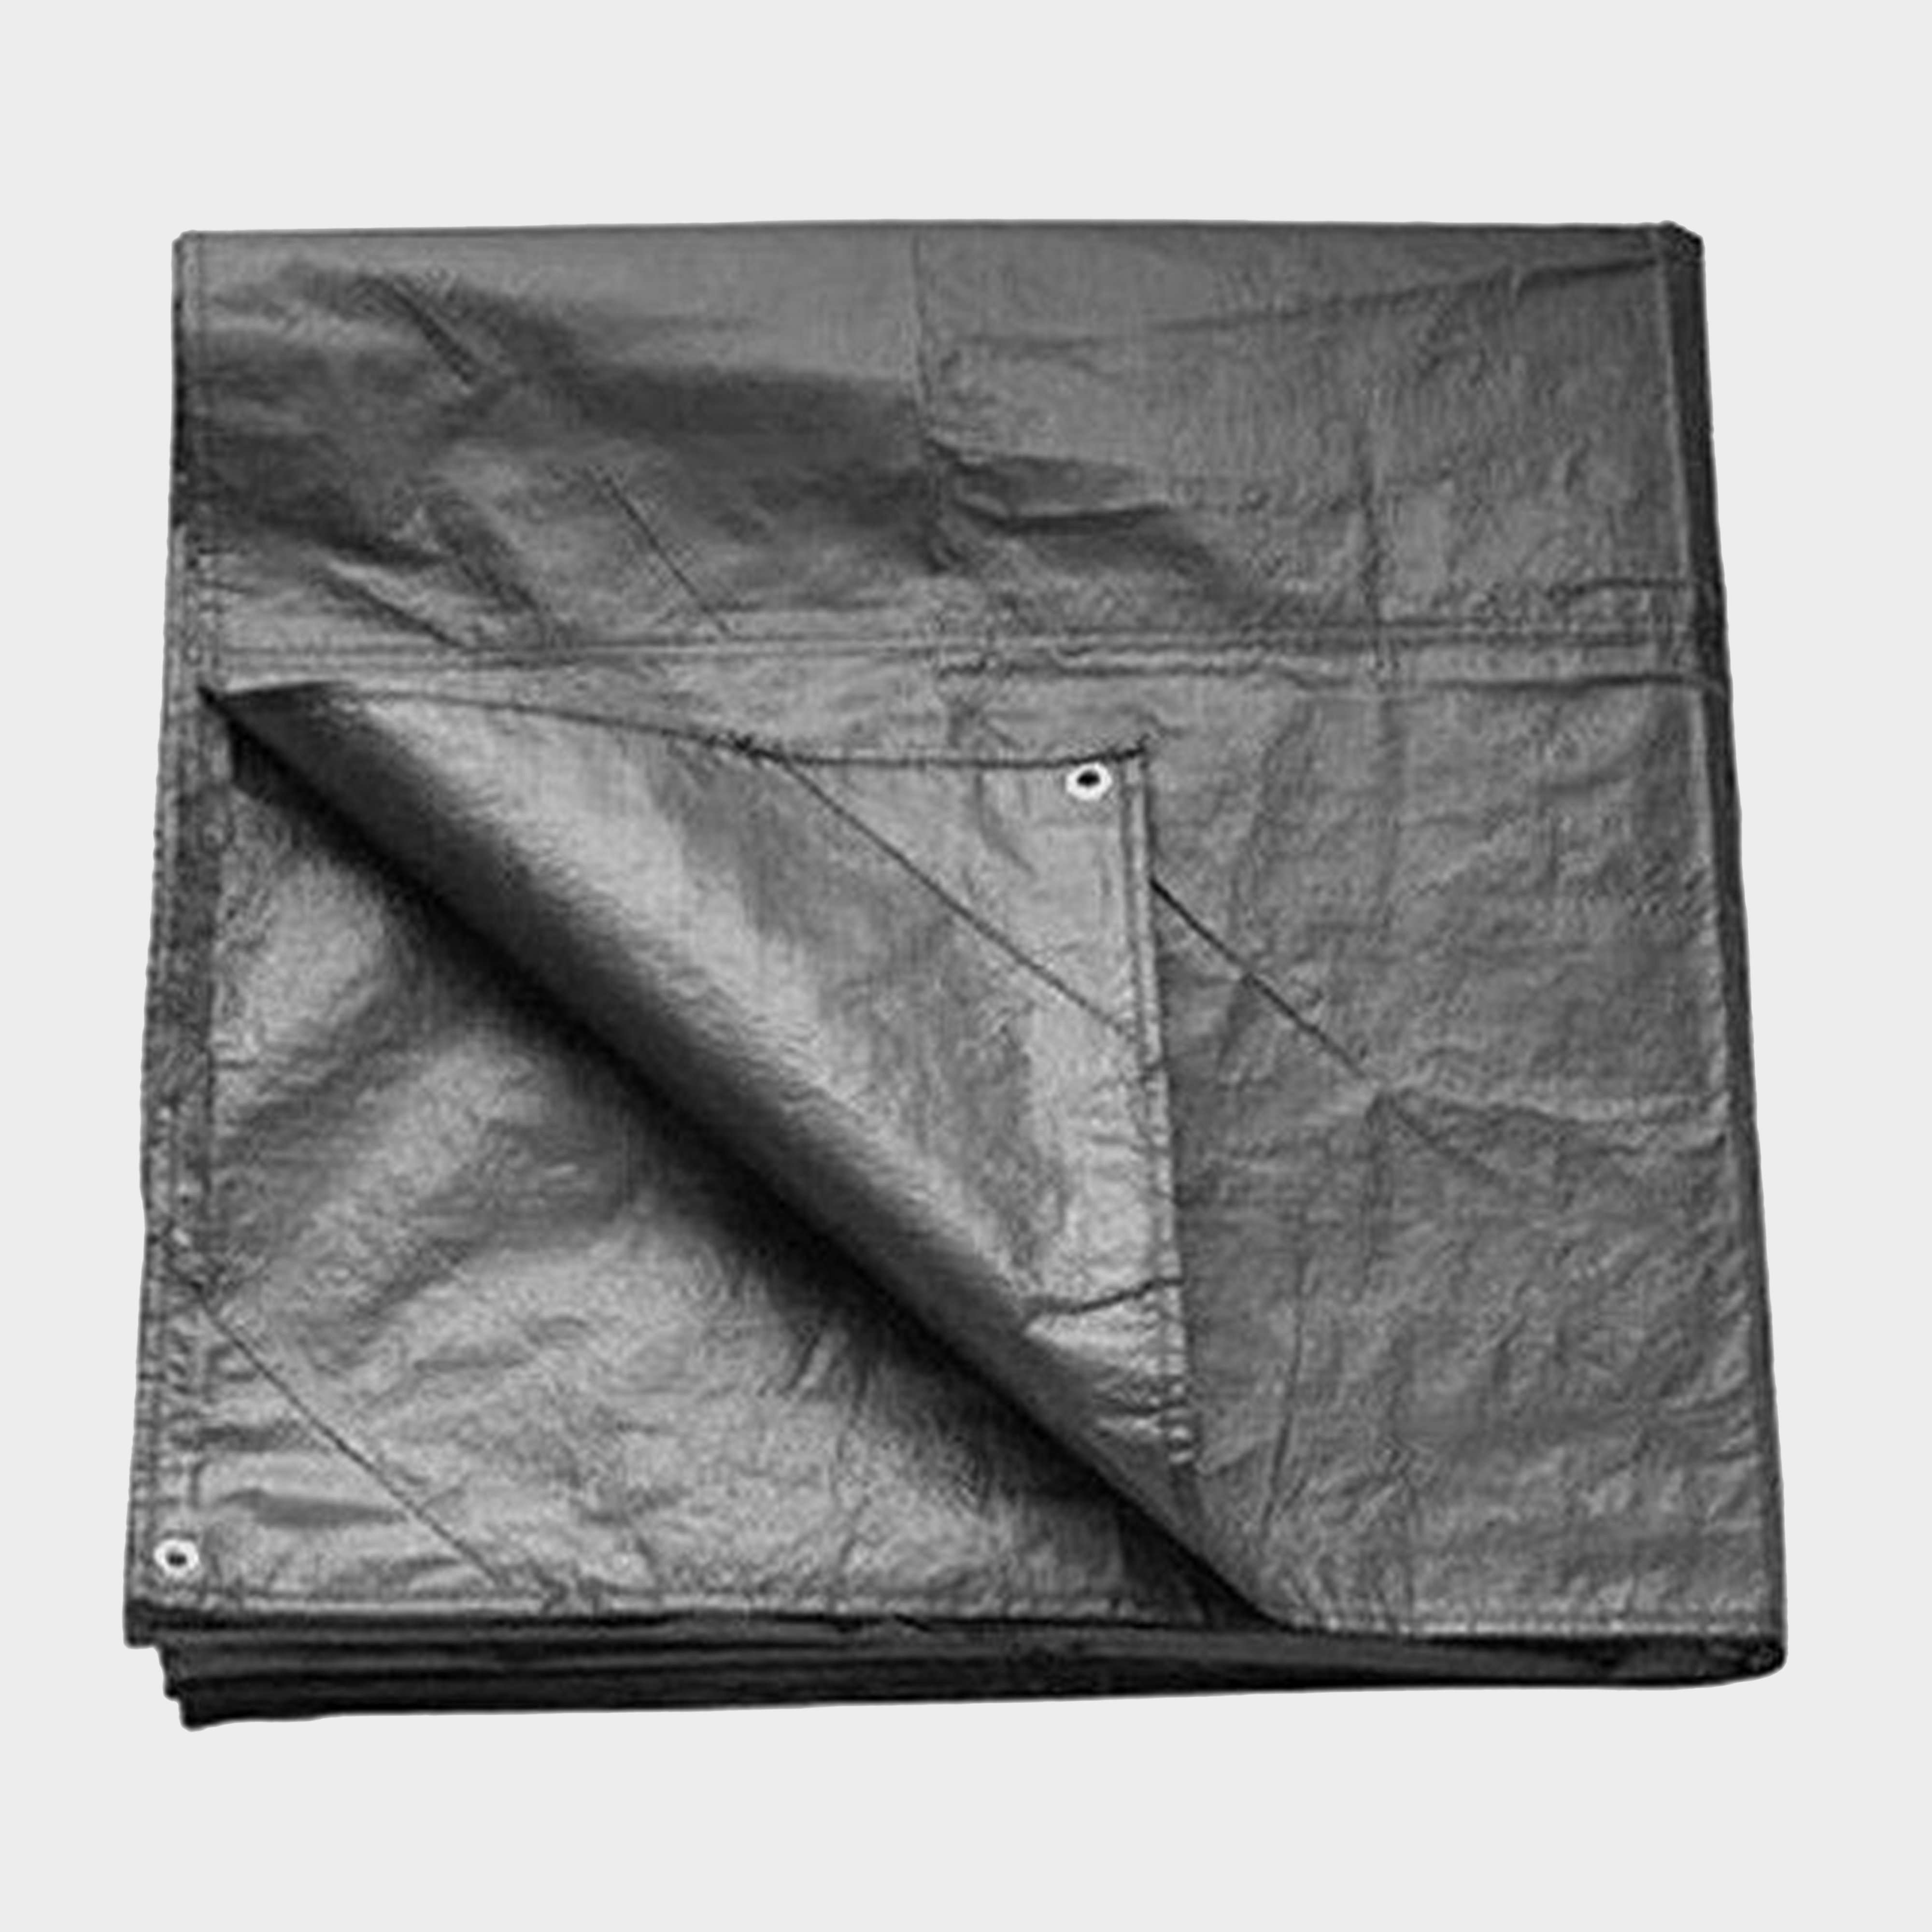 VANGO PVC Groundsheet - Large